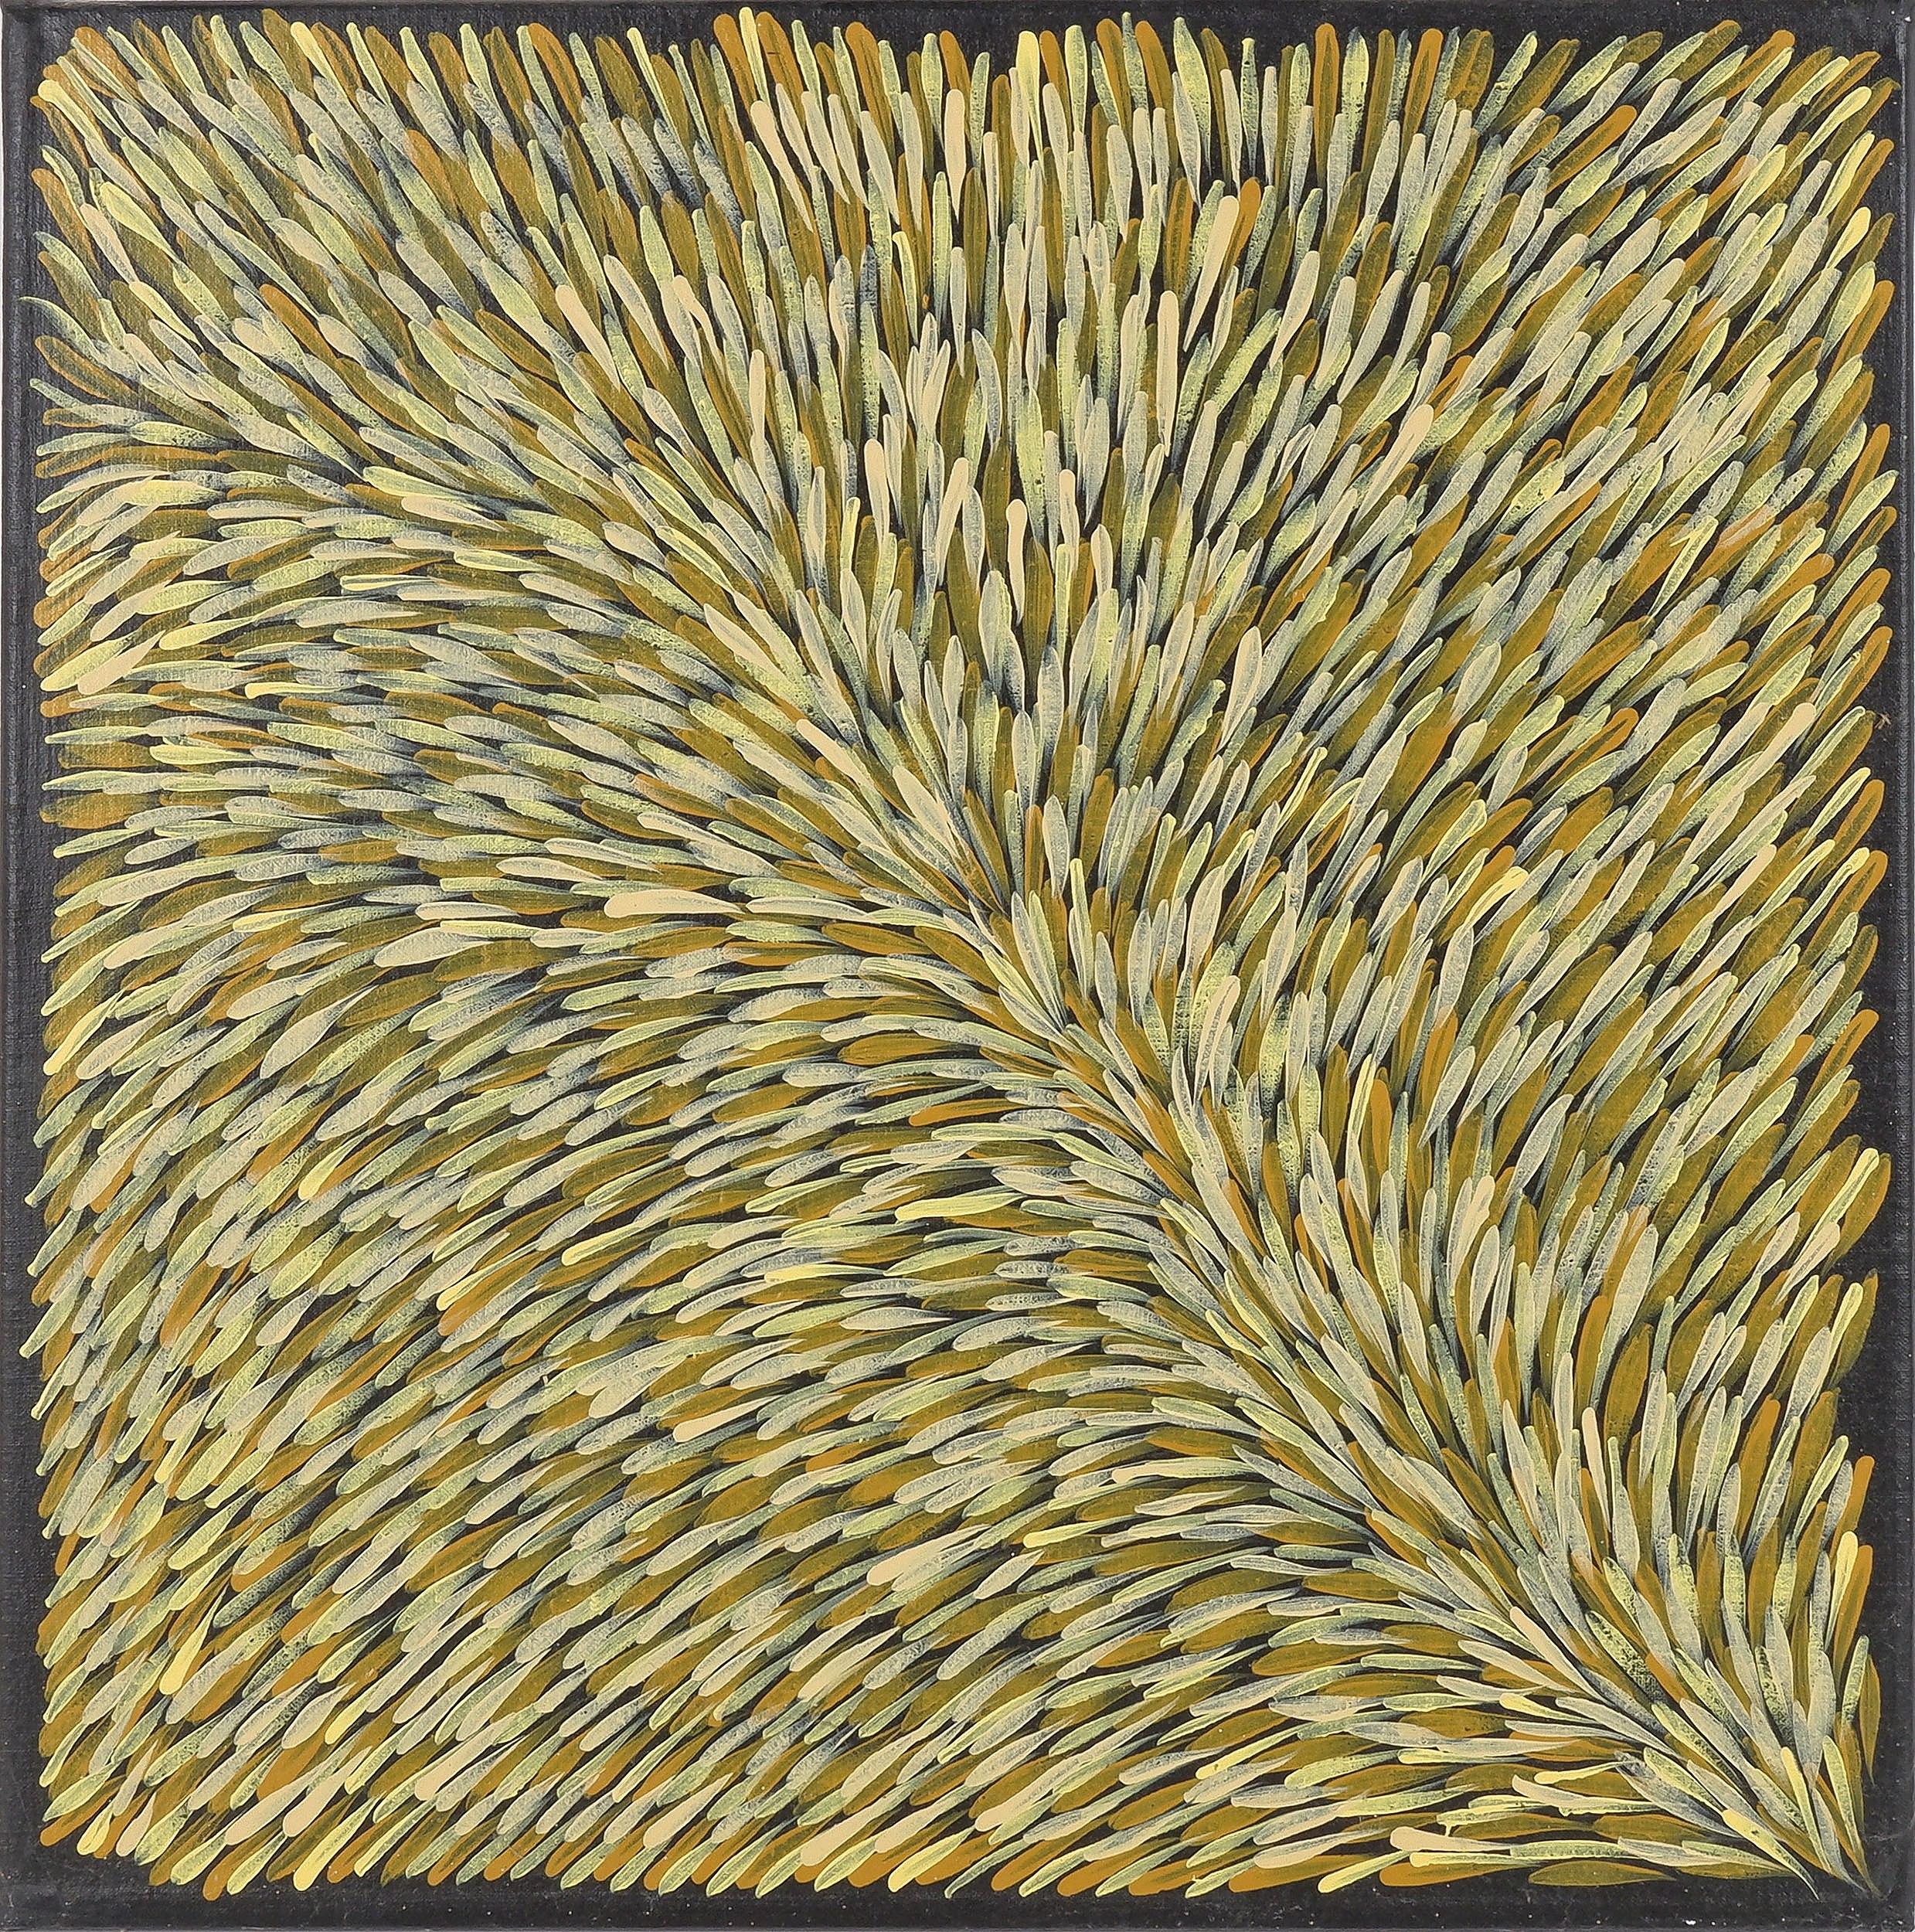 'Gloria Tamerre Petyarre (c.1938-) Fallen Leaves, Acrylic on Linen'